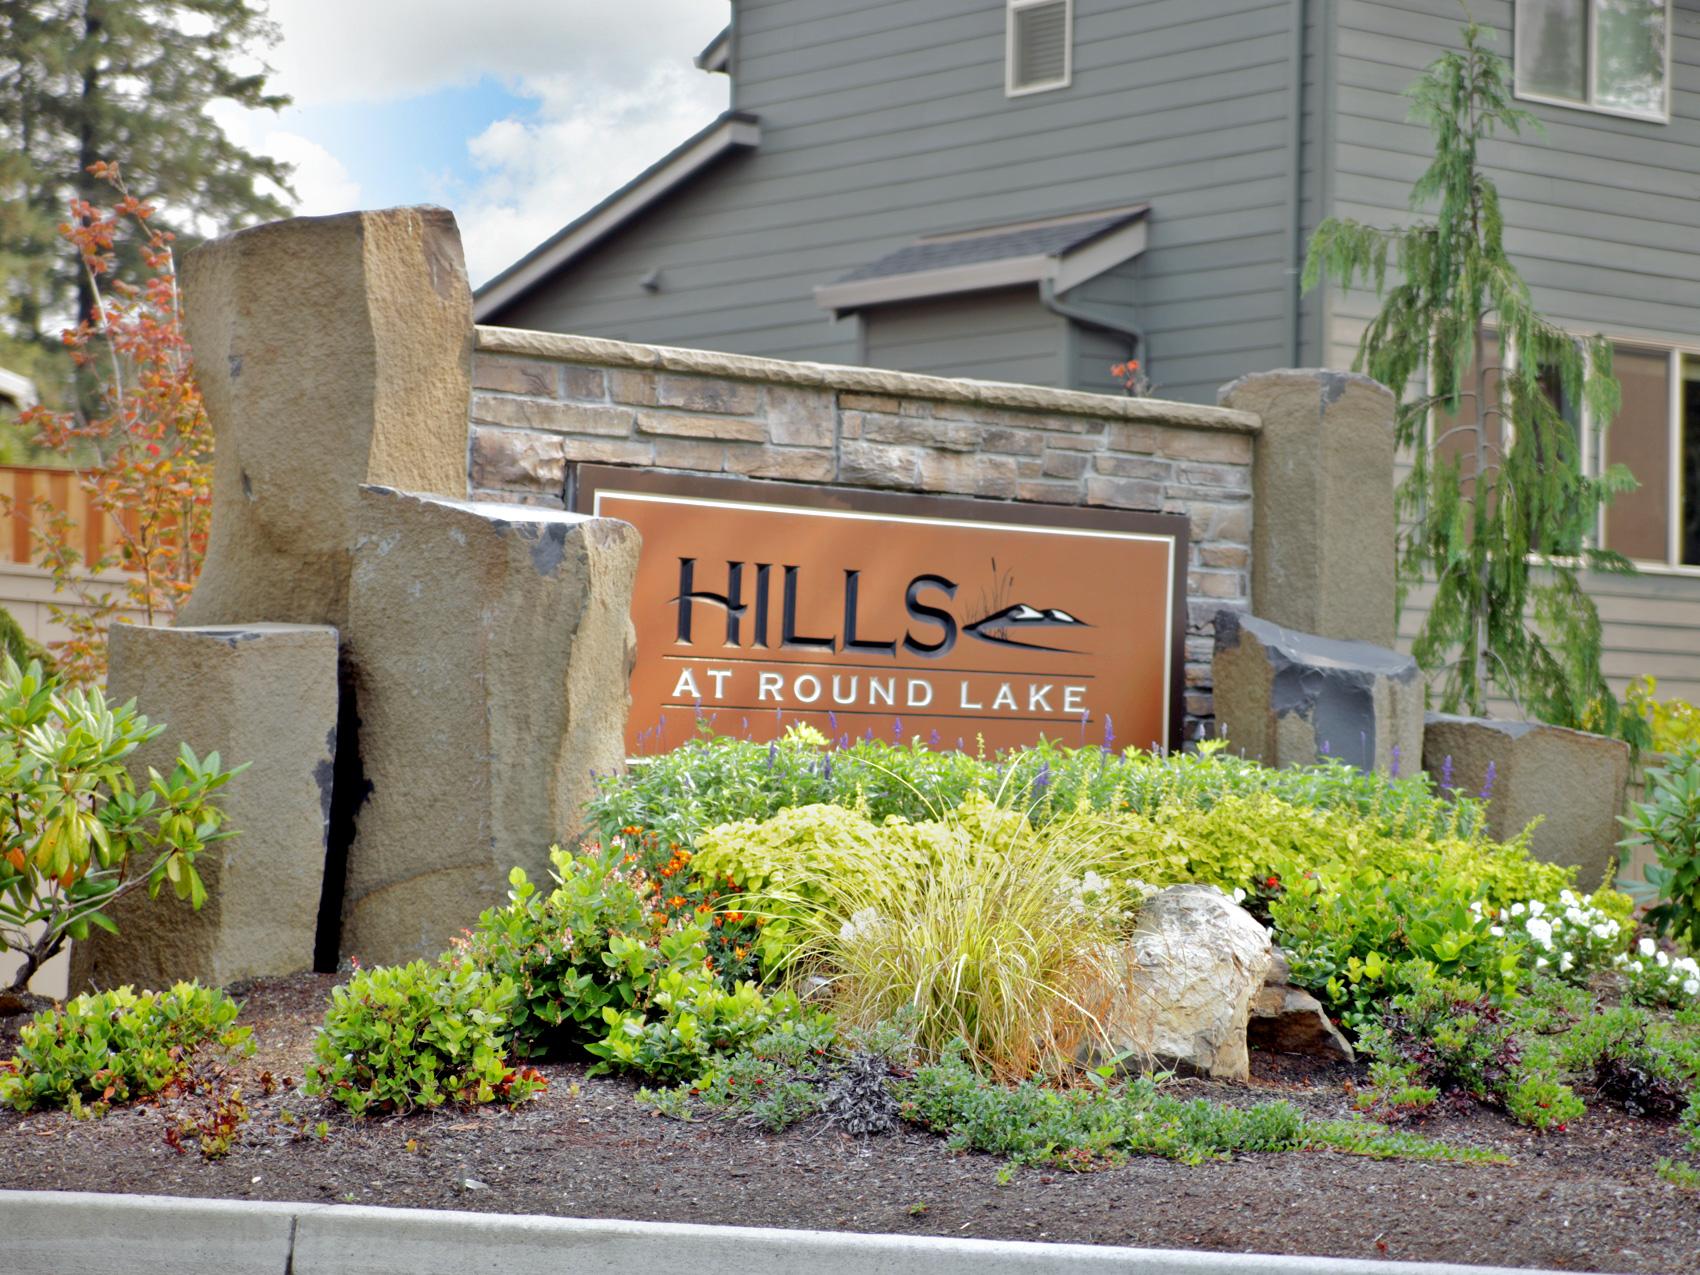 Holt_Hills-at-Round-Lake_02.jpg